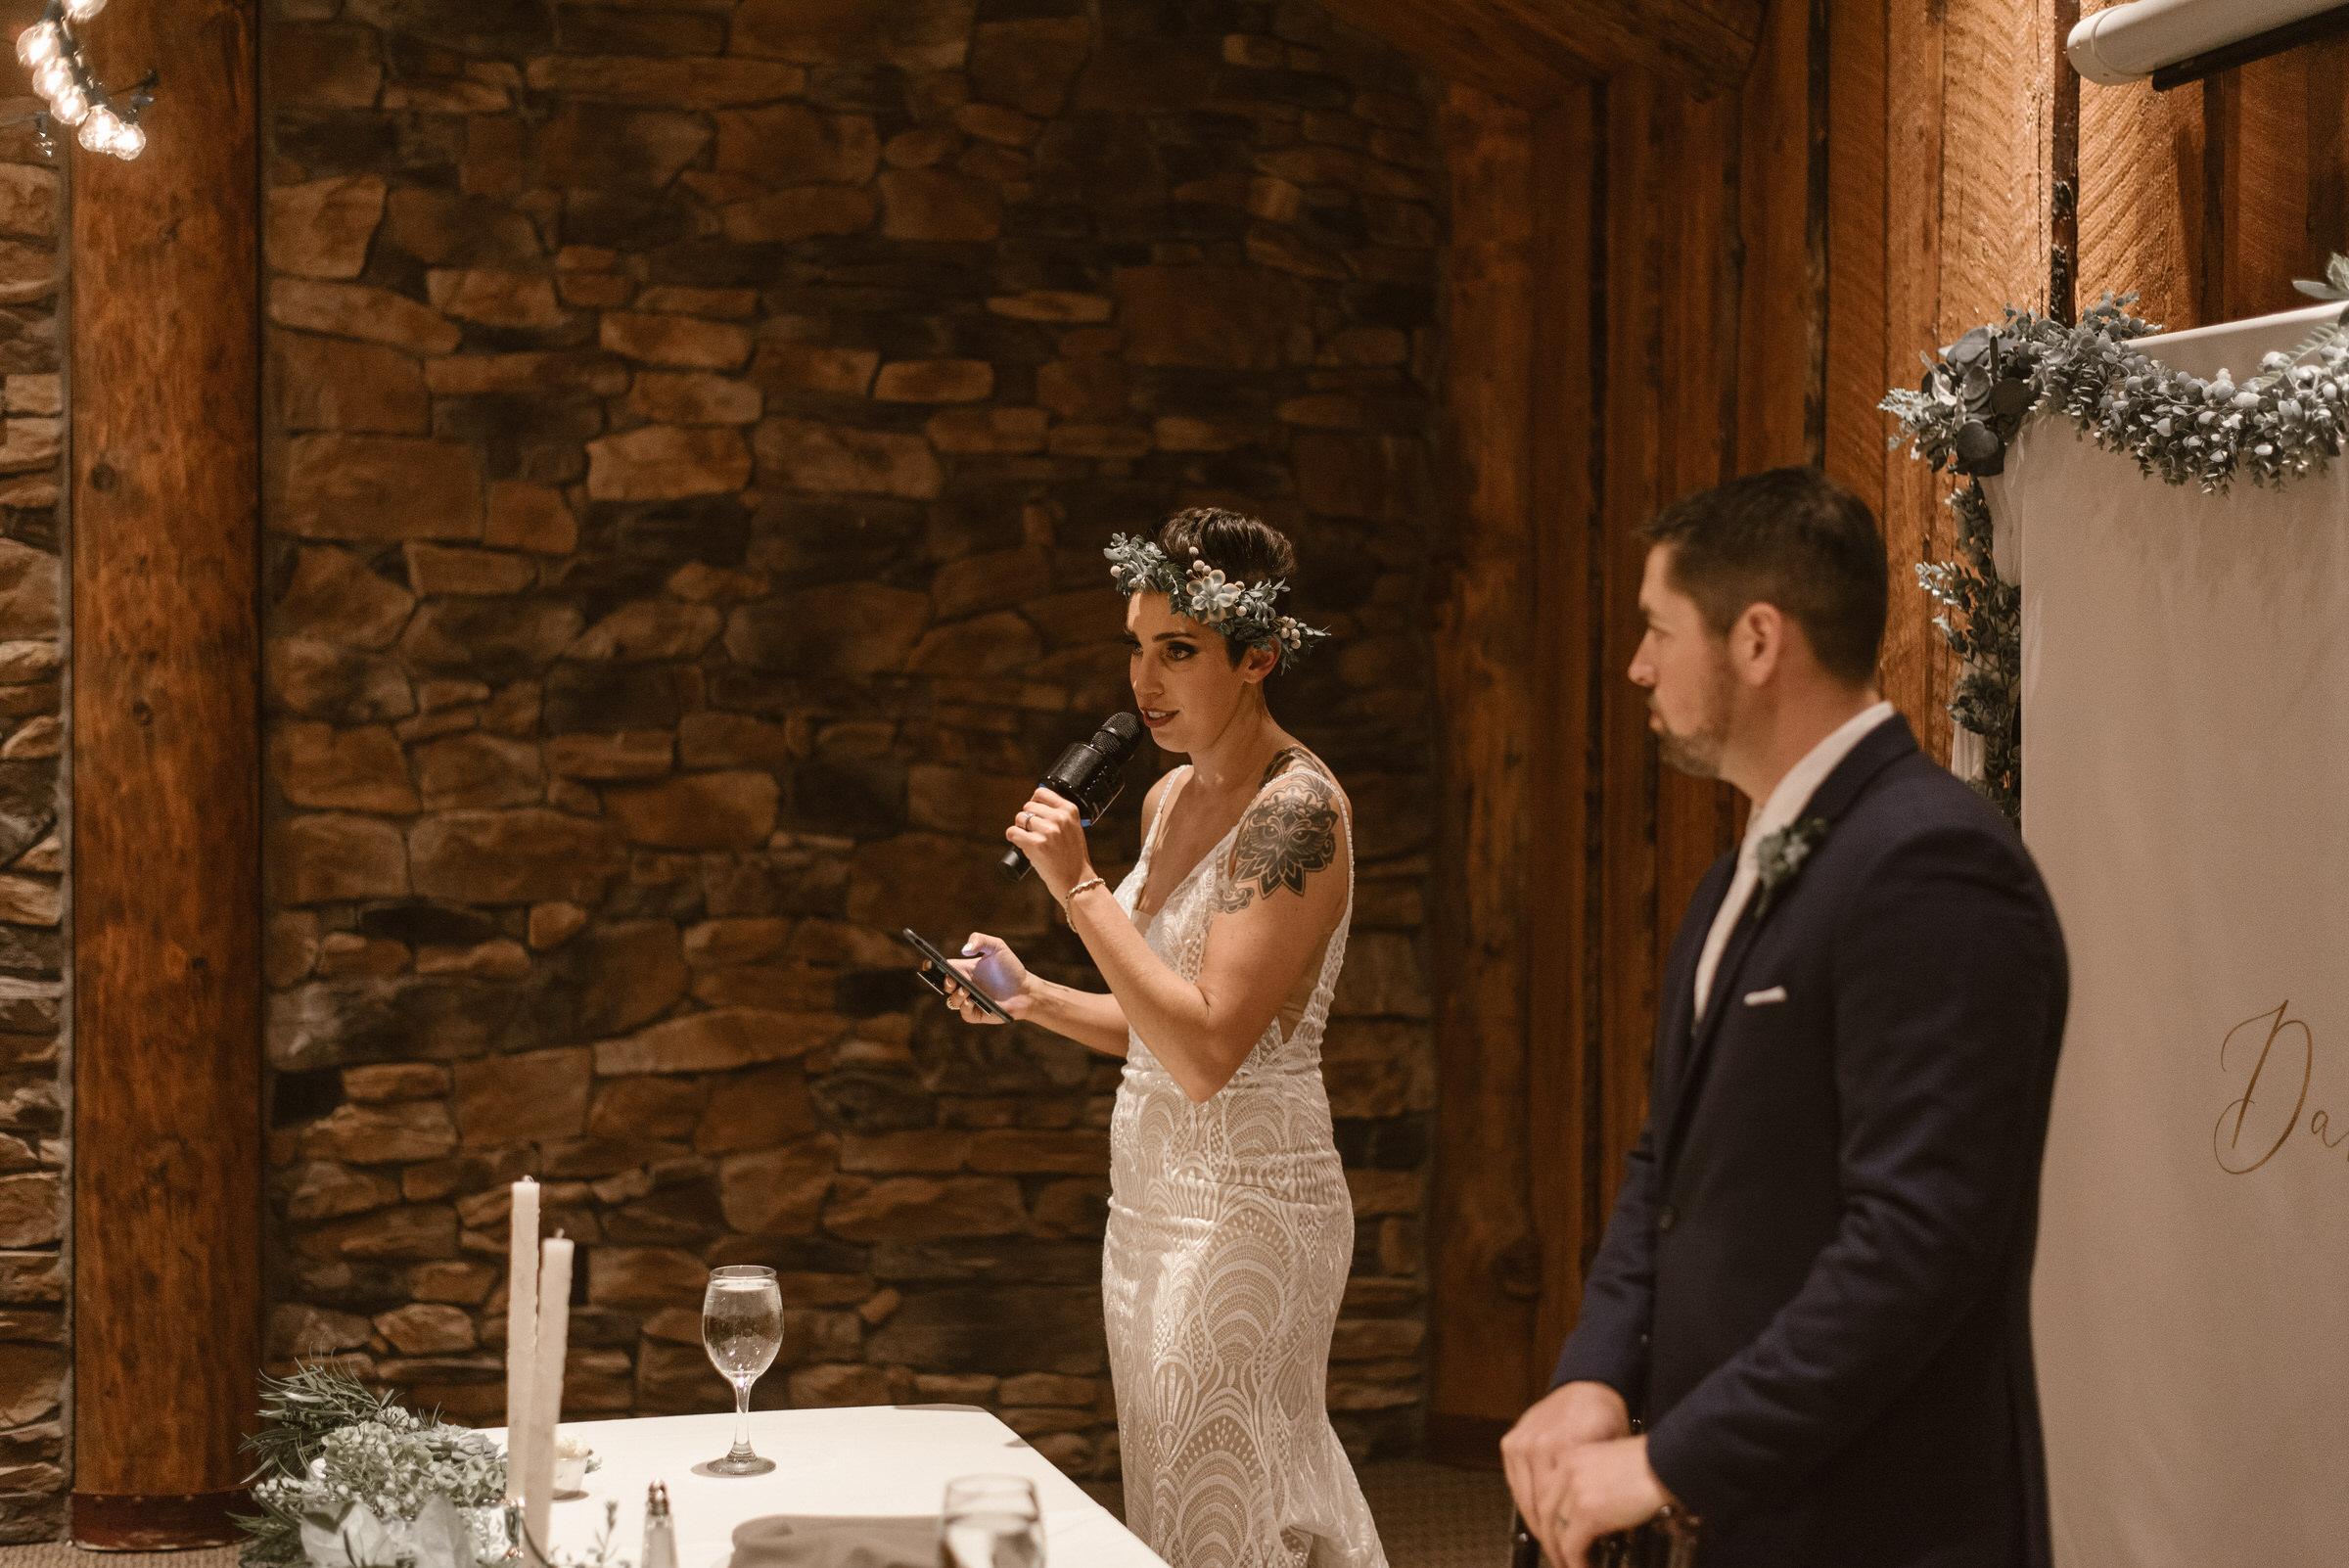 Wilderness-Ridge-Lincoln-Nebraska-Wedding-Kaylie-Sirek-Photography-098.jpg